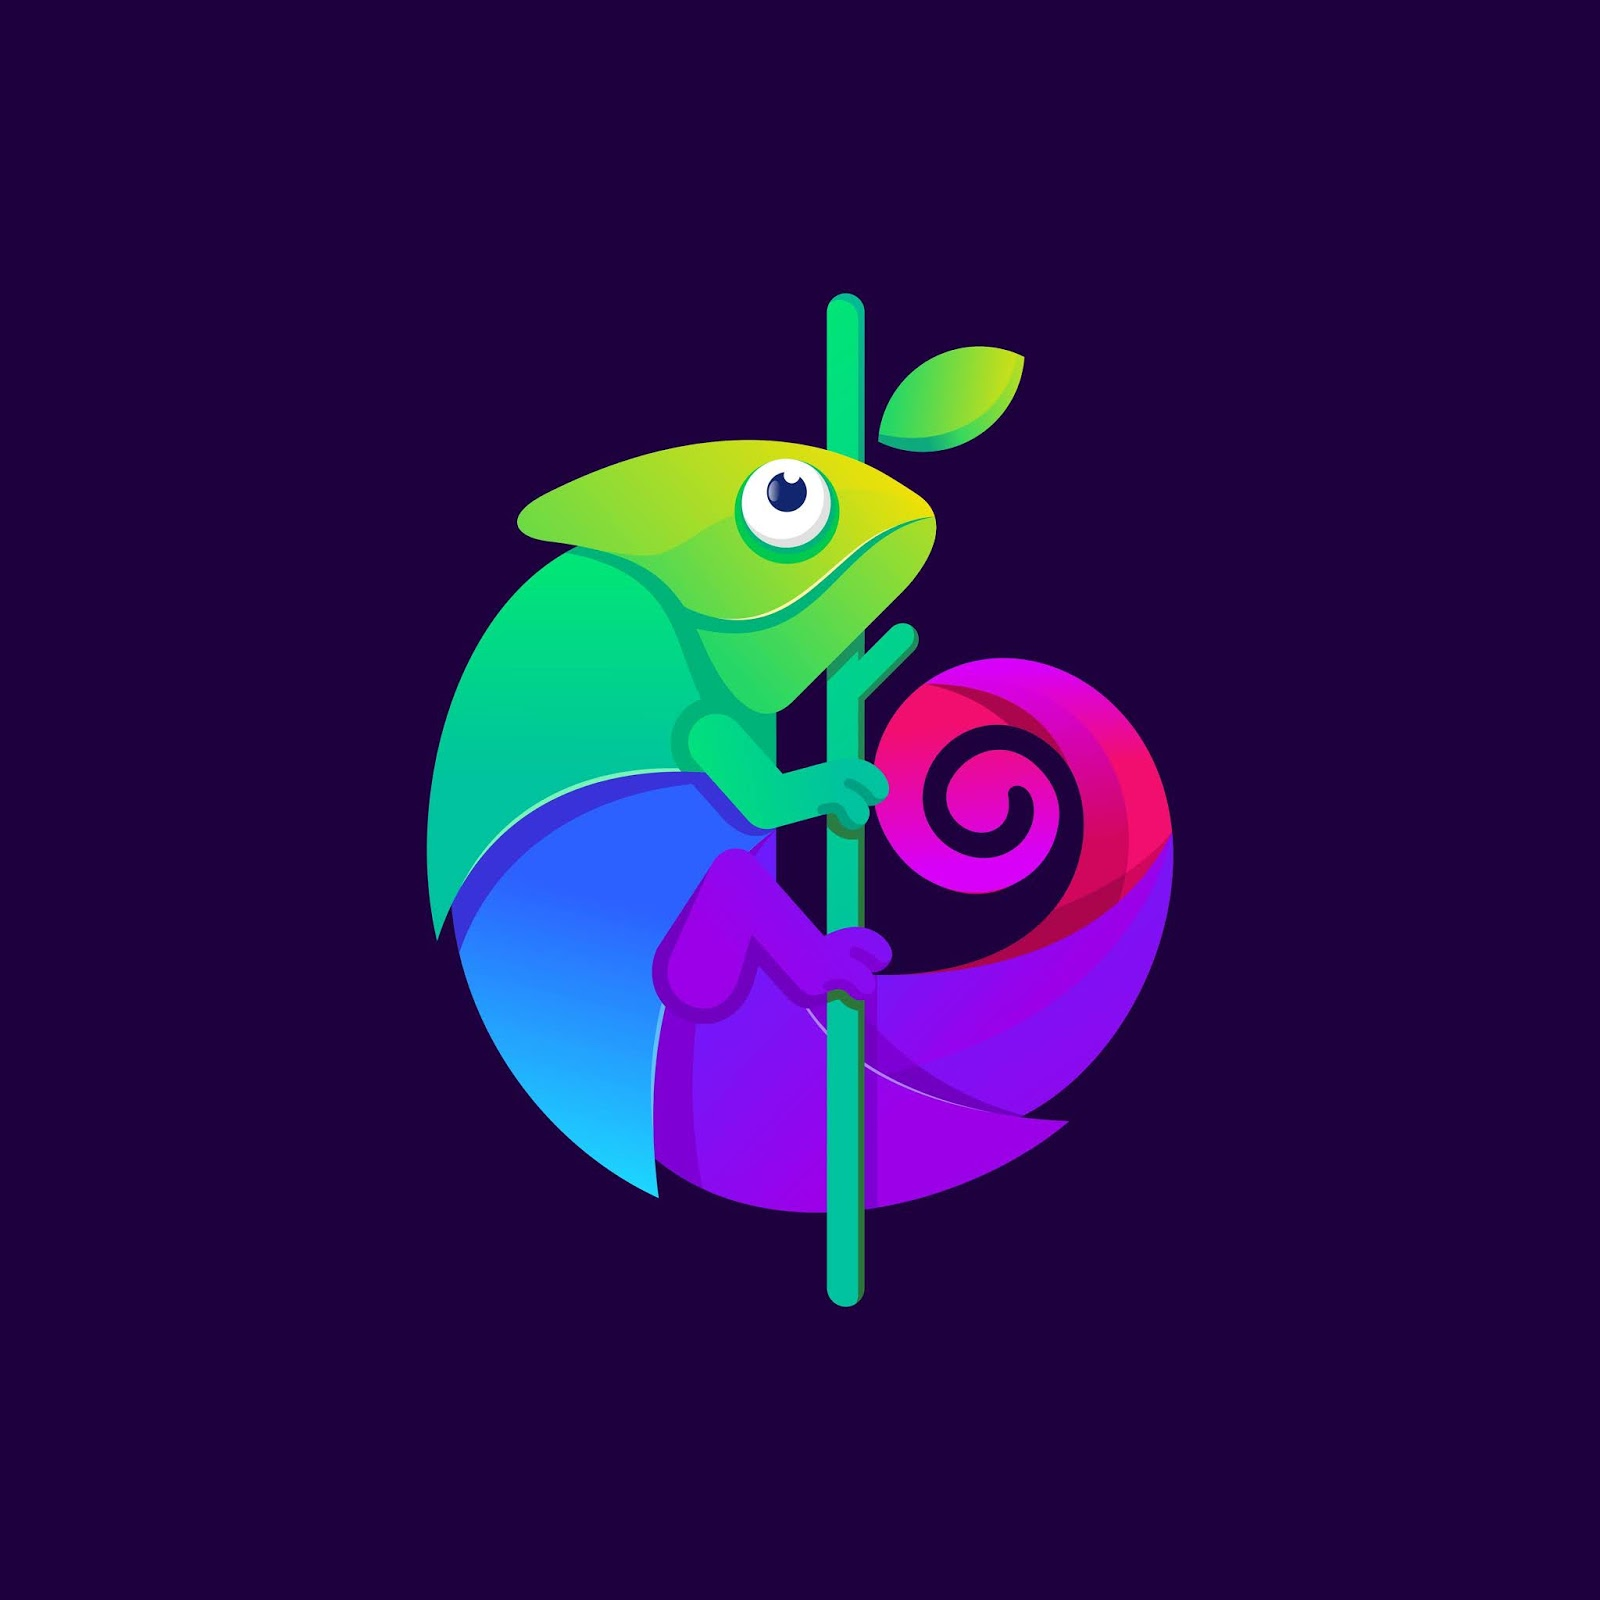 Colorful Chameleon Logo Design Illustration.jpg Free Download Vector CDR, AI, EPS and PNG Formats